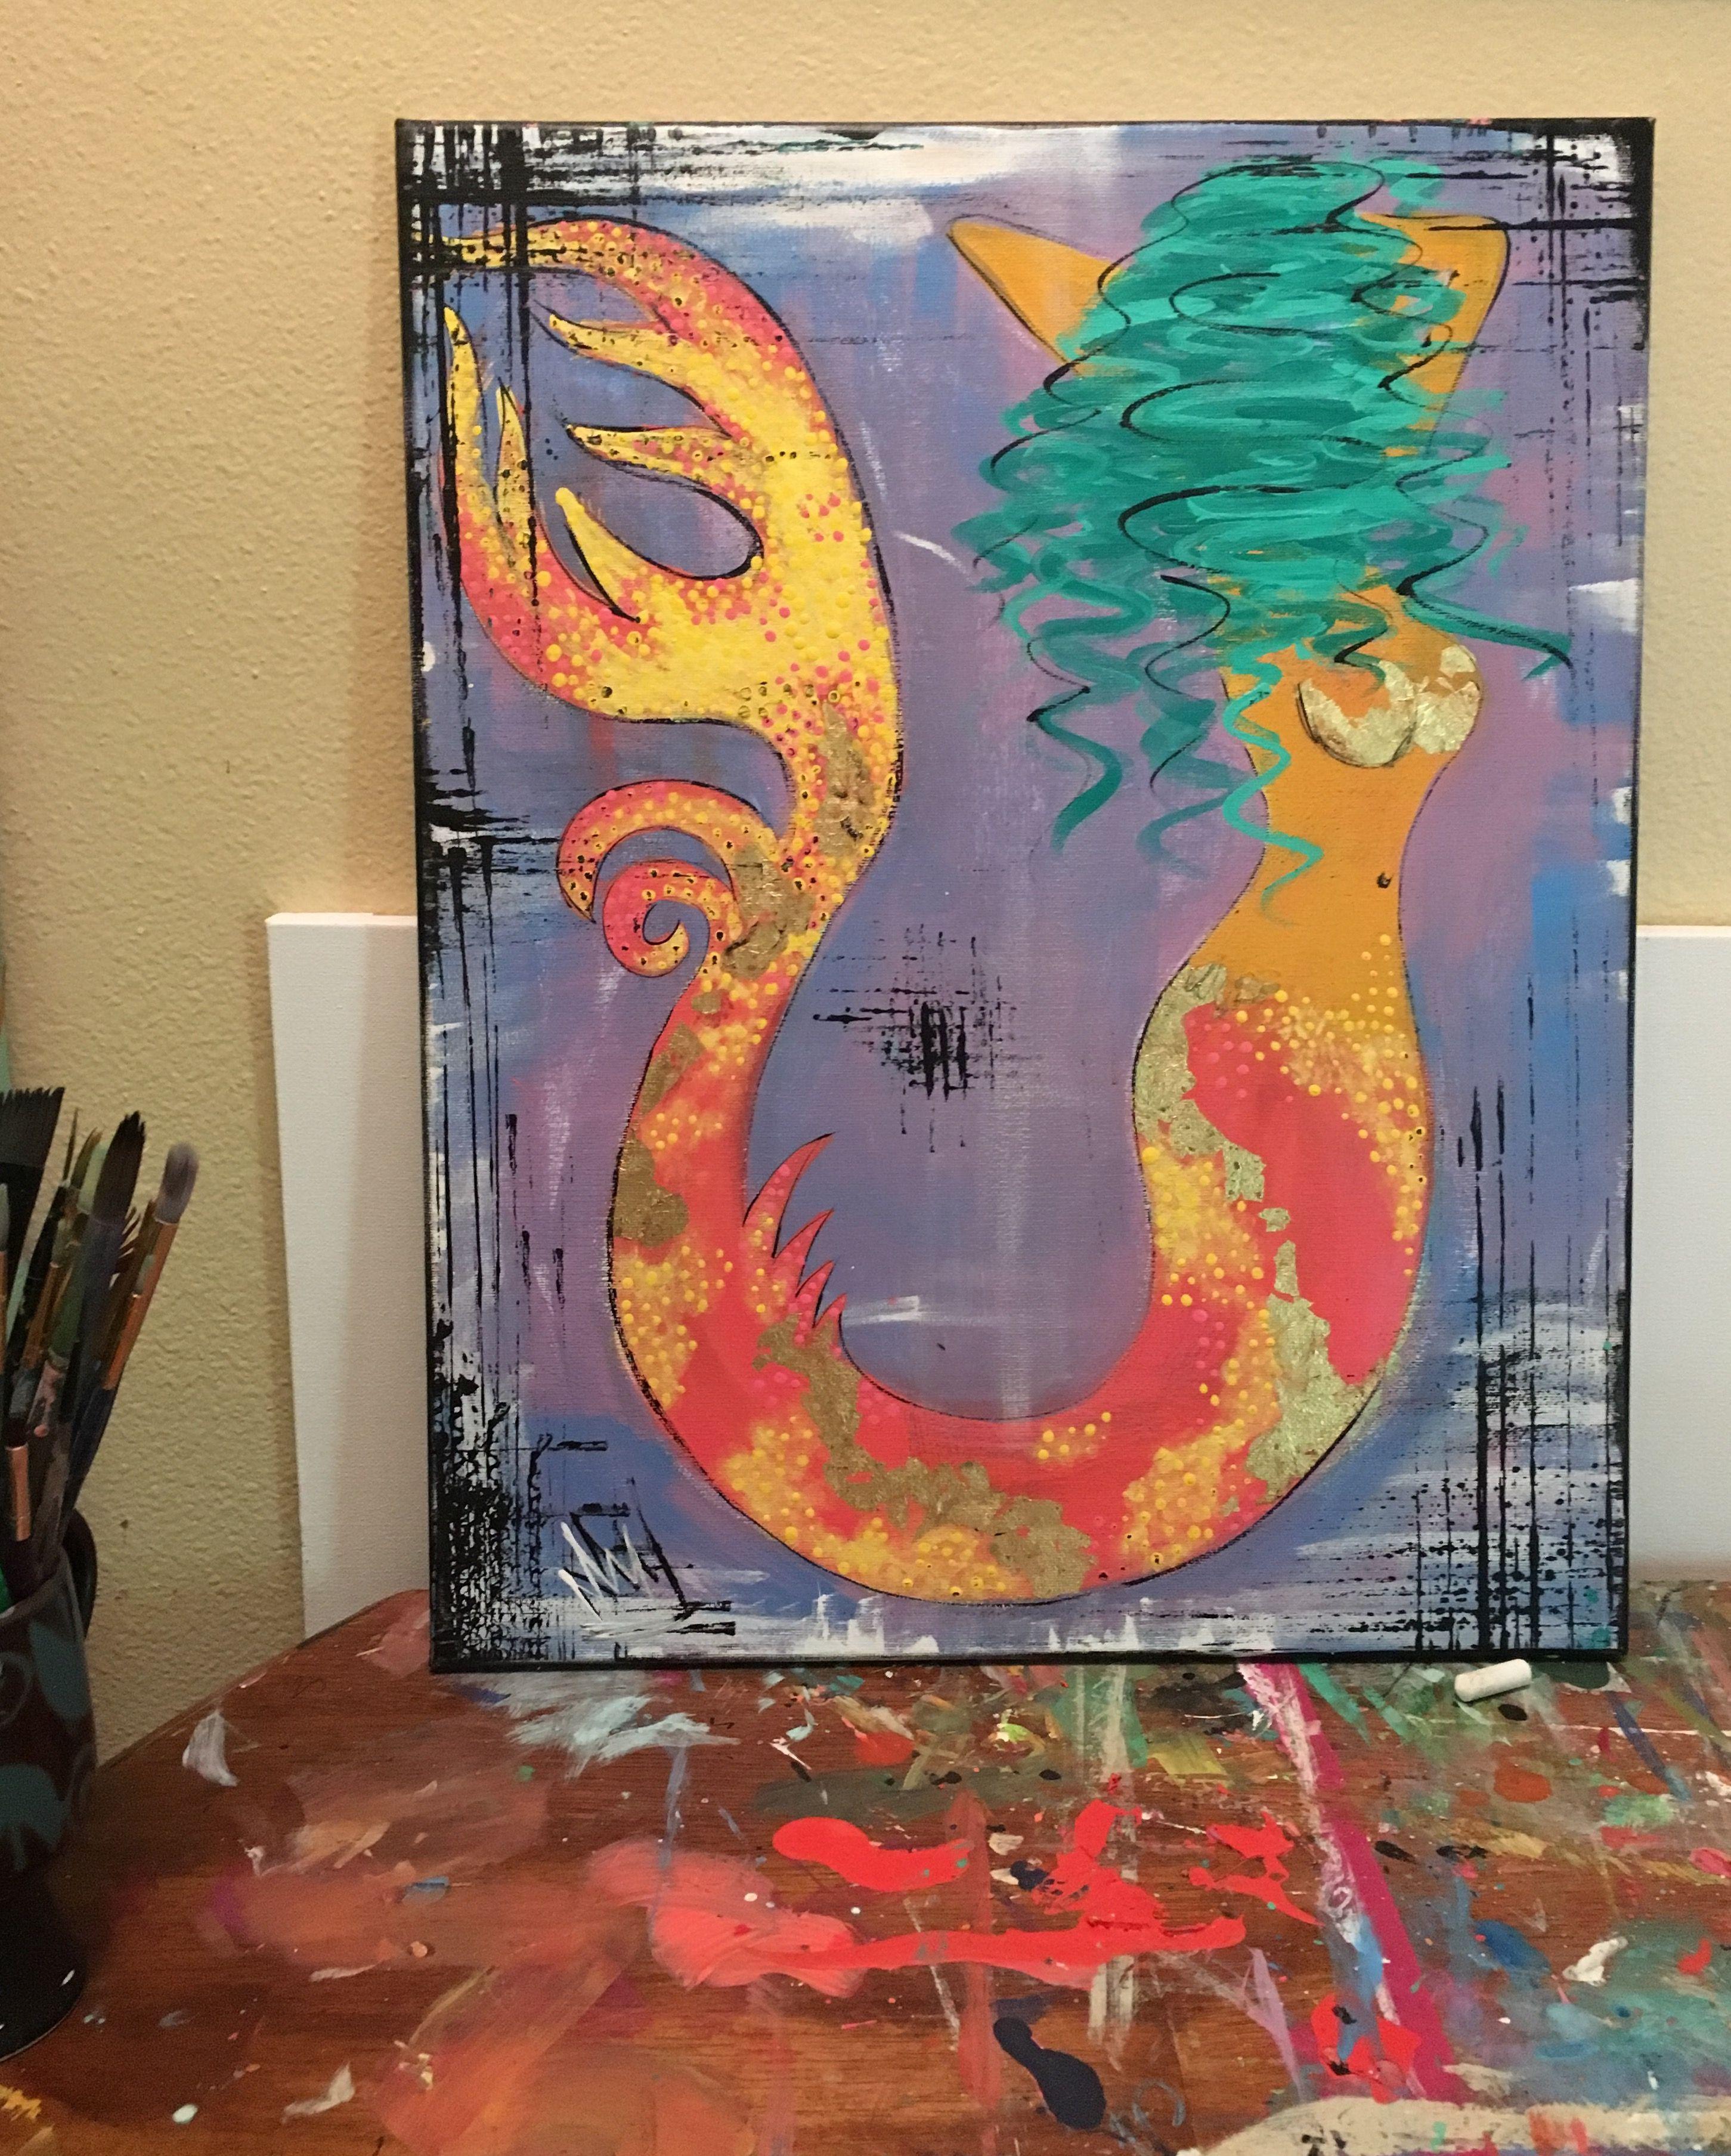 Mermaid. Painting. Art. Canvas. Acrylic. Abstract. Ocean